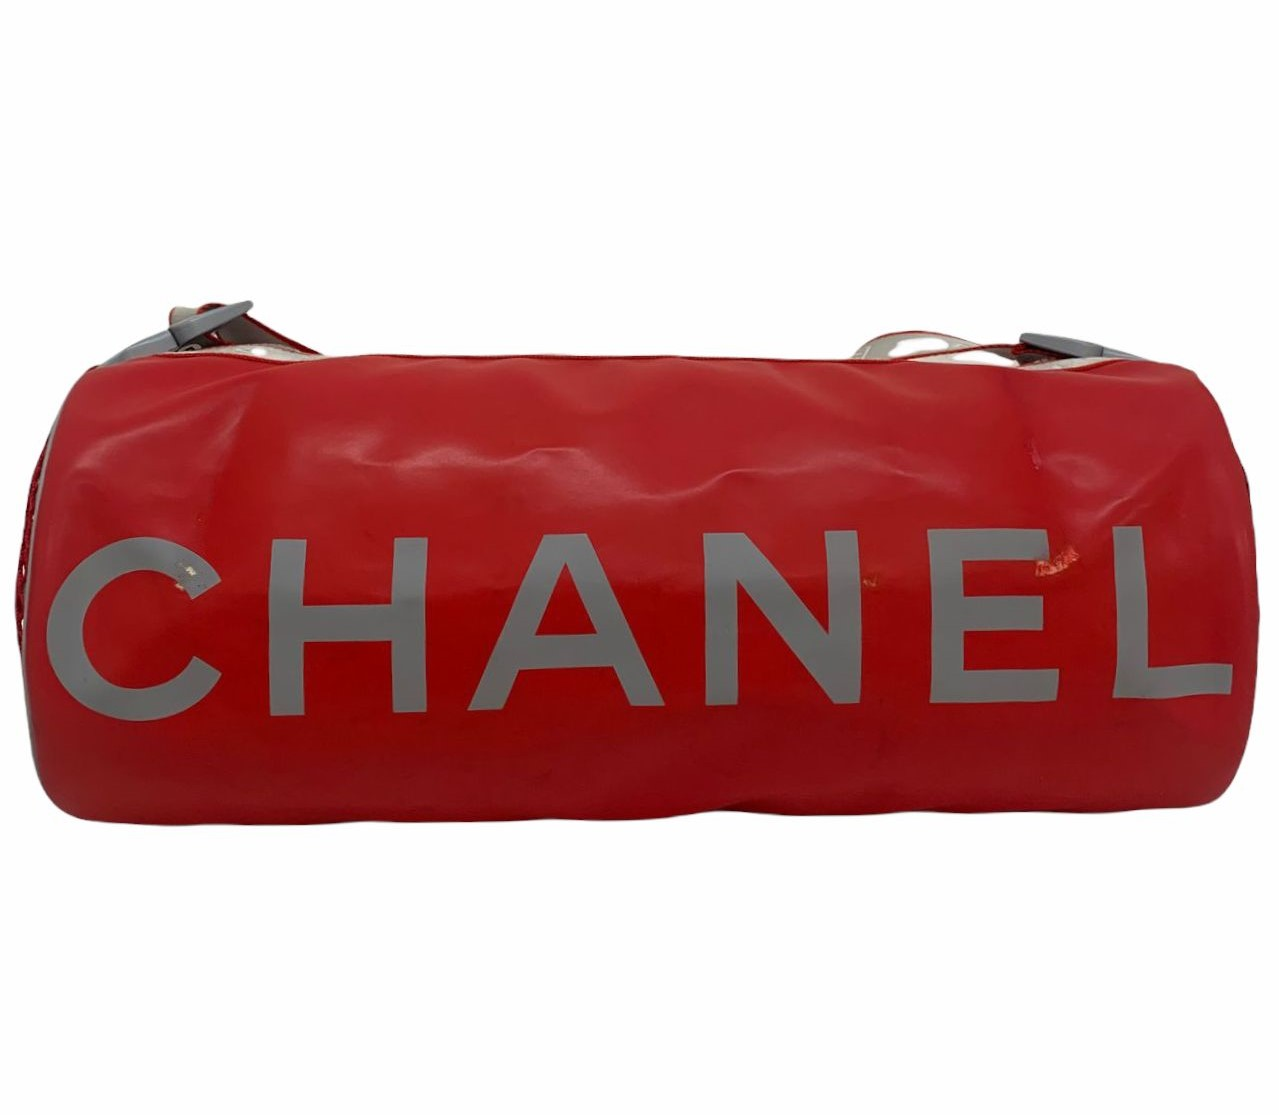 Bolsa Chanel Sports Line Coco Mark Boston Vermelha